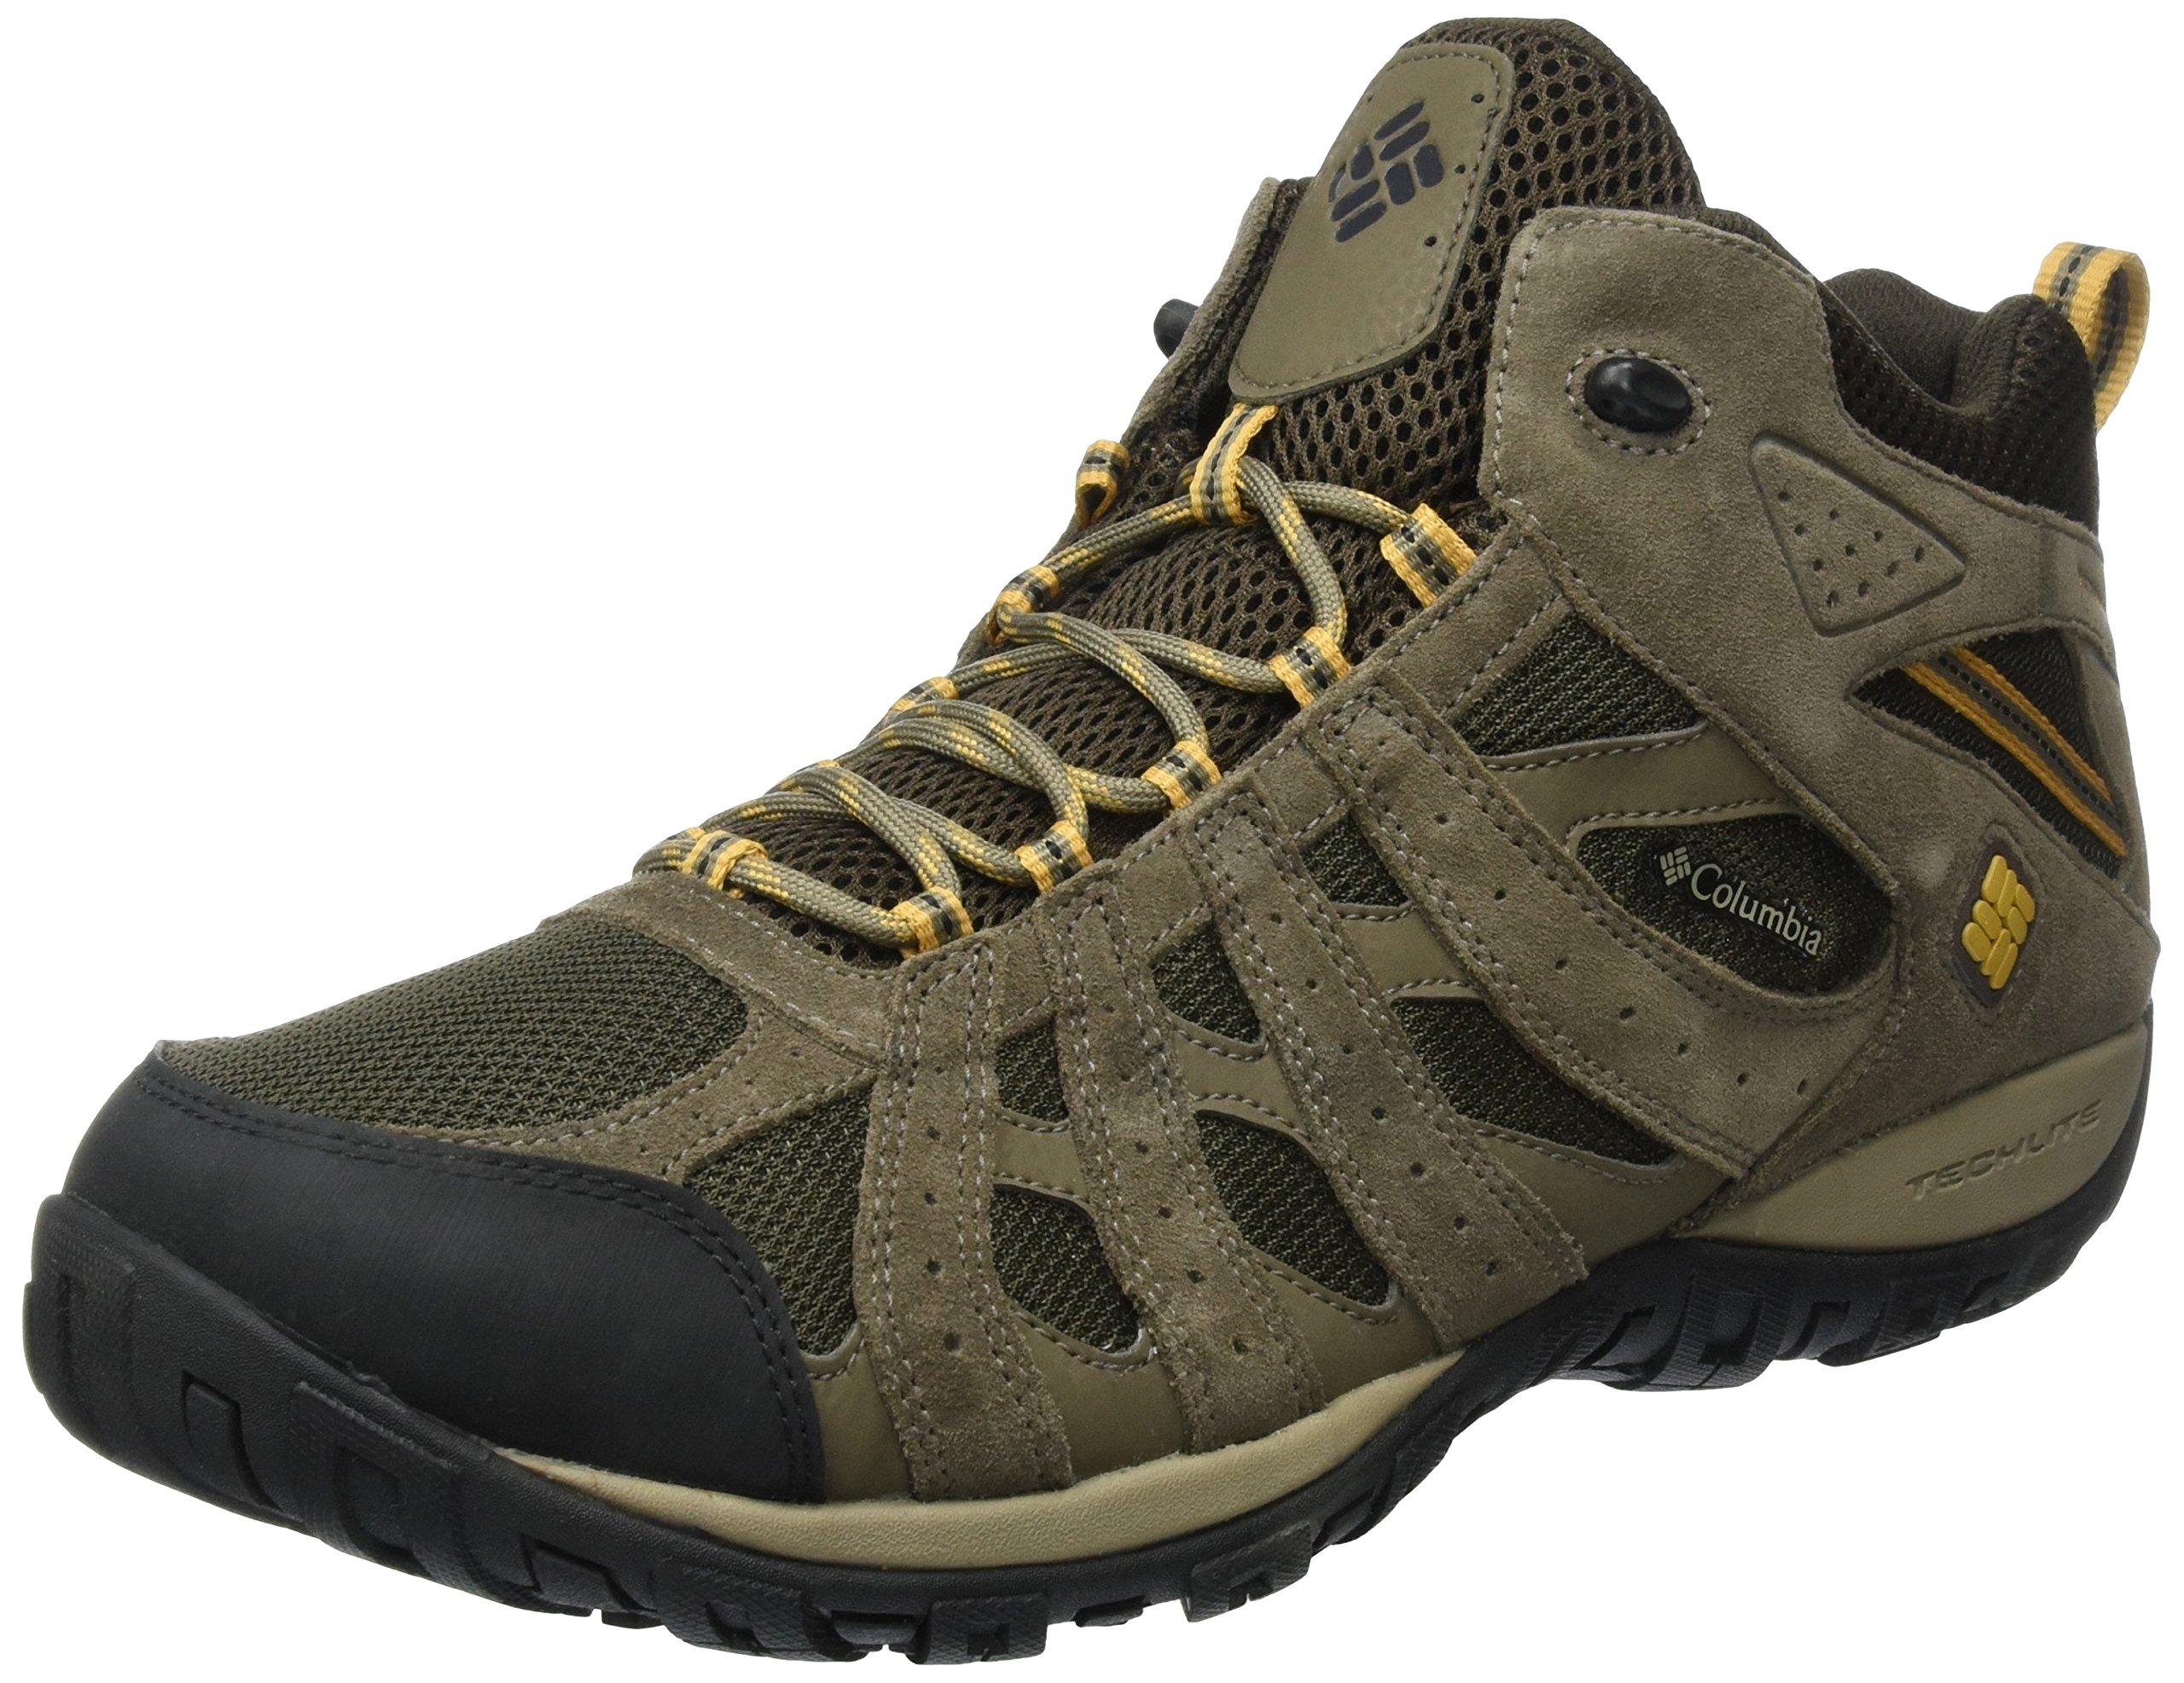 Columbia Men's Redmond Mid Waterproof Boot, Breathable, High-Traction Grip Hiking, Cordovan, Dark Banana, 11 D US